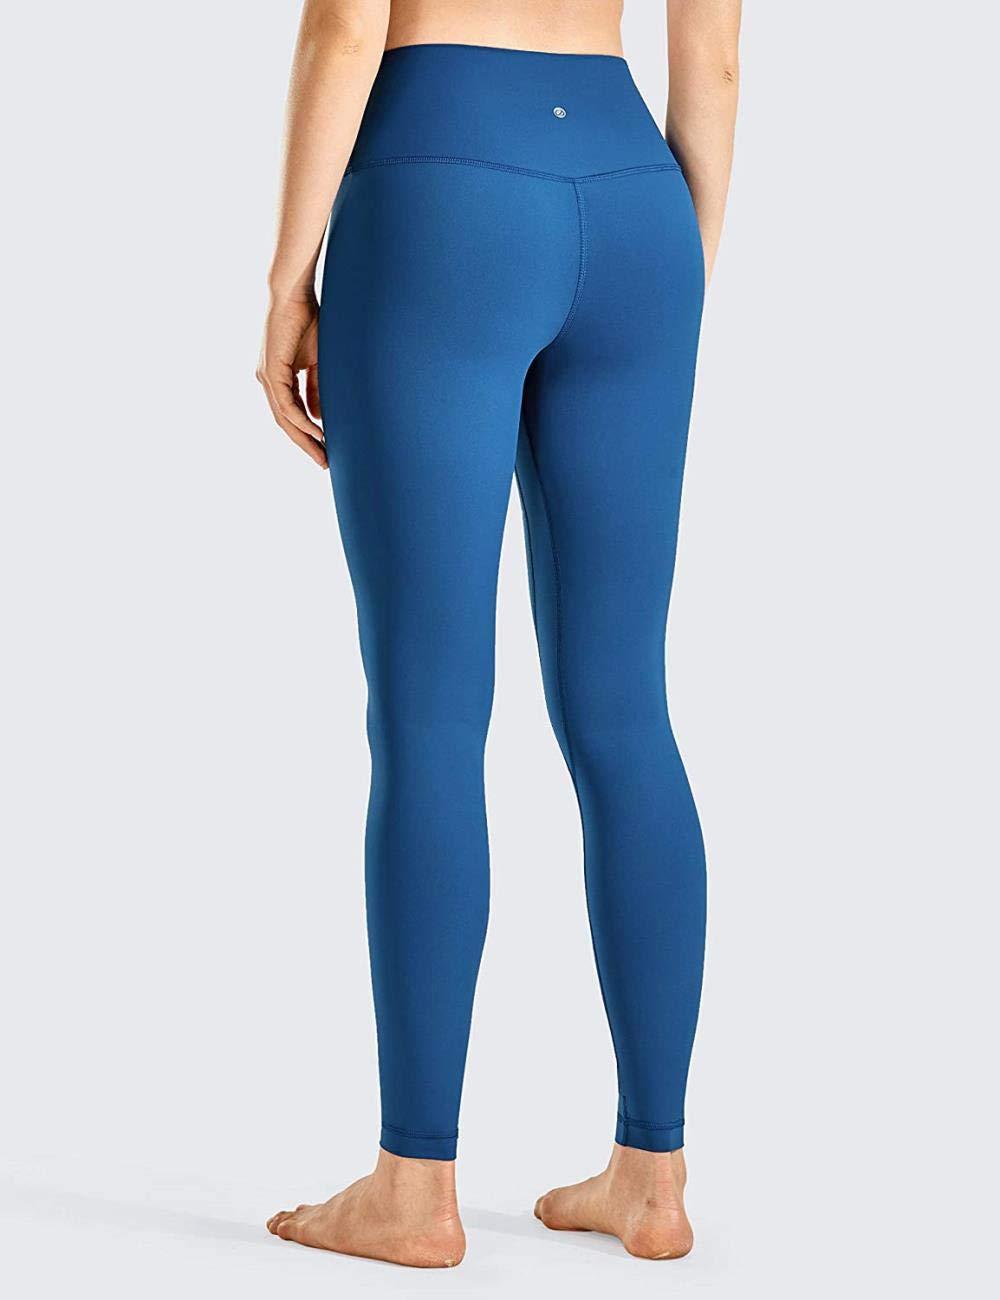 TUAN Kvinnor Naken Mesh Hög Midja Gym Leggings med Sra?Sport Yogabyxor havsblå